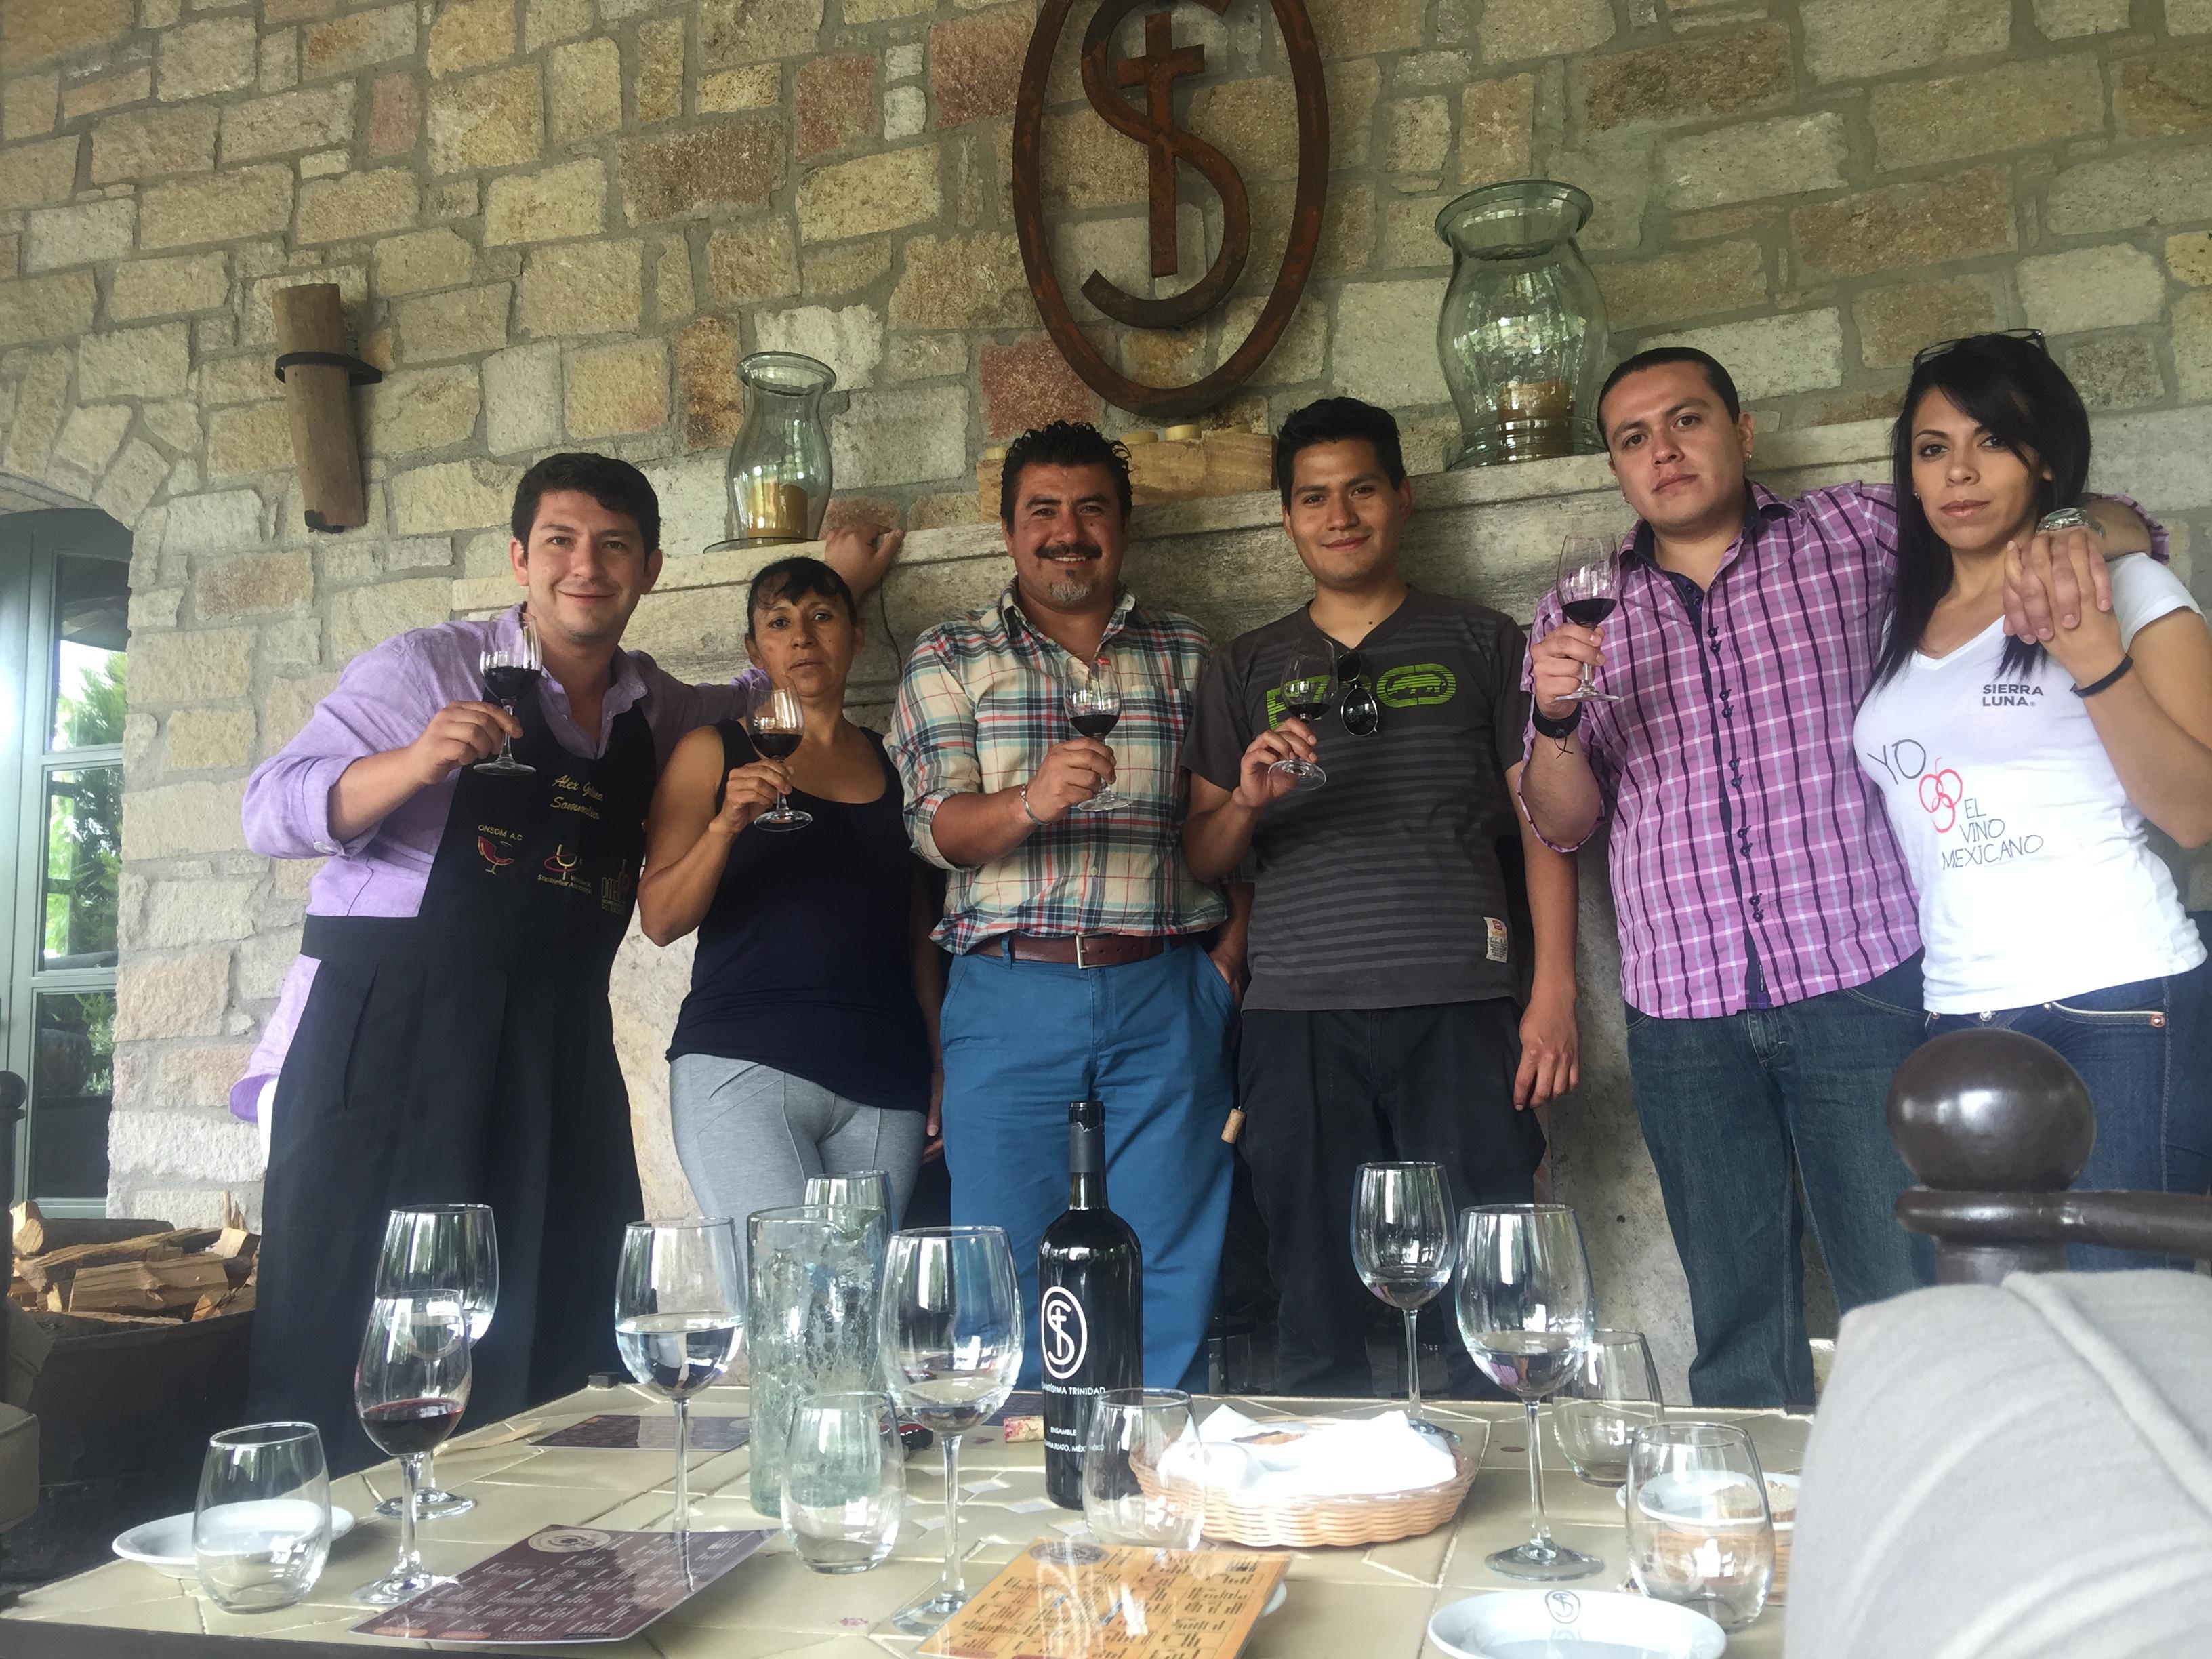 Cata de vino mexicano